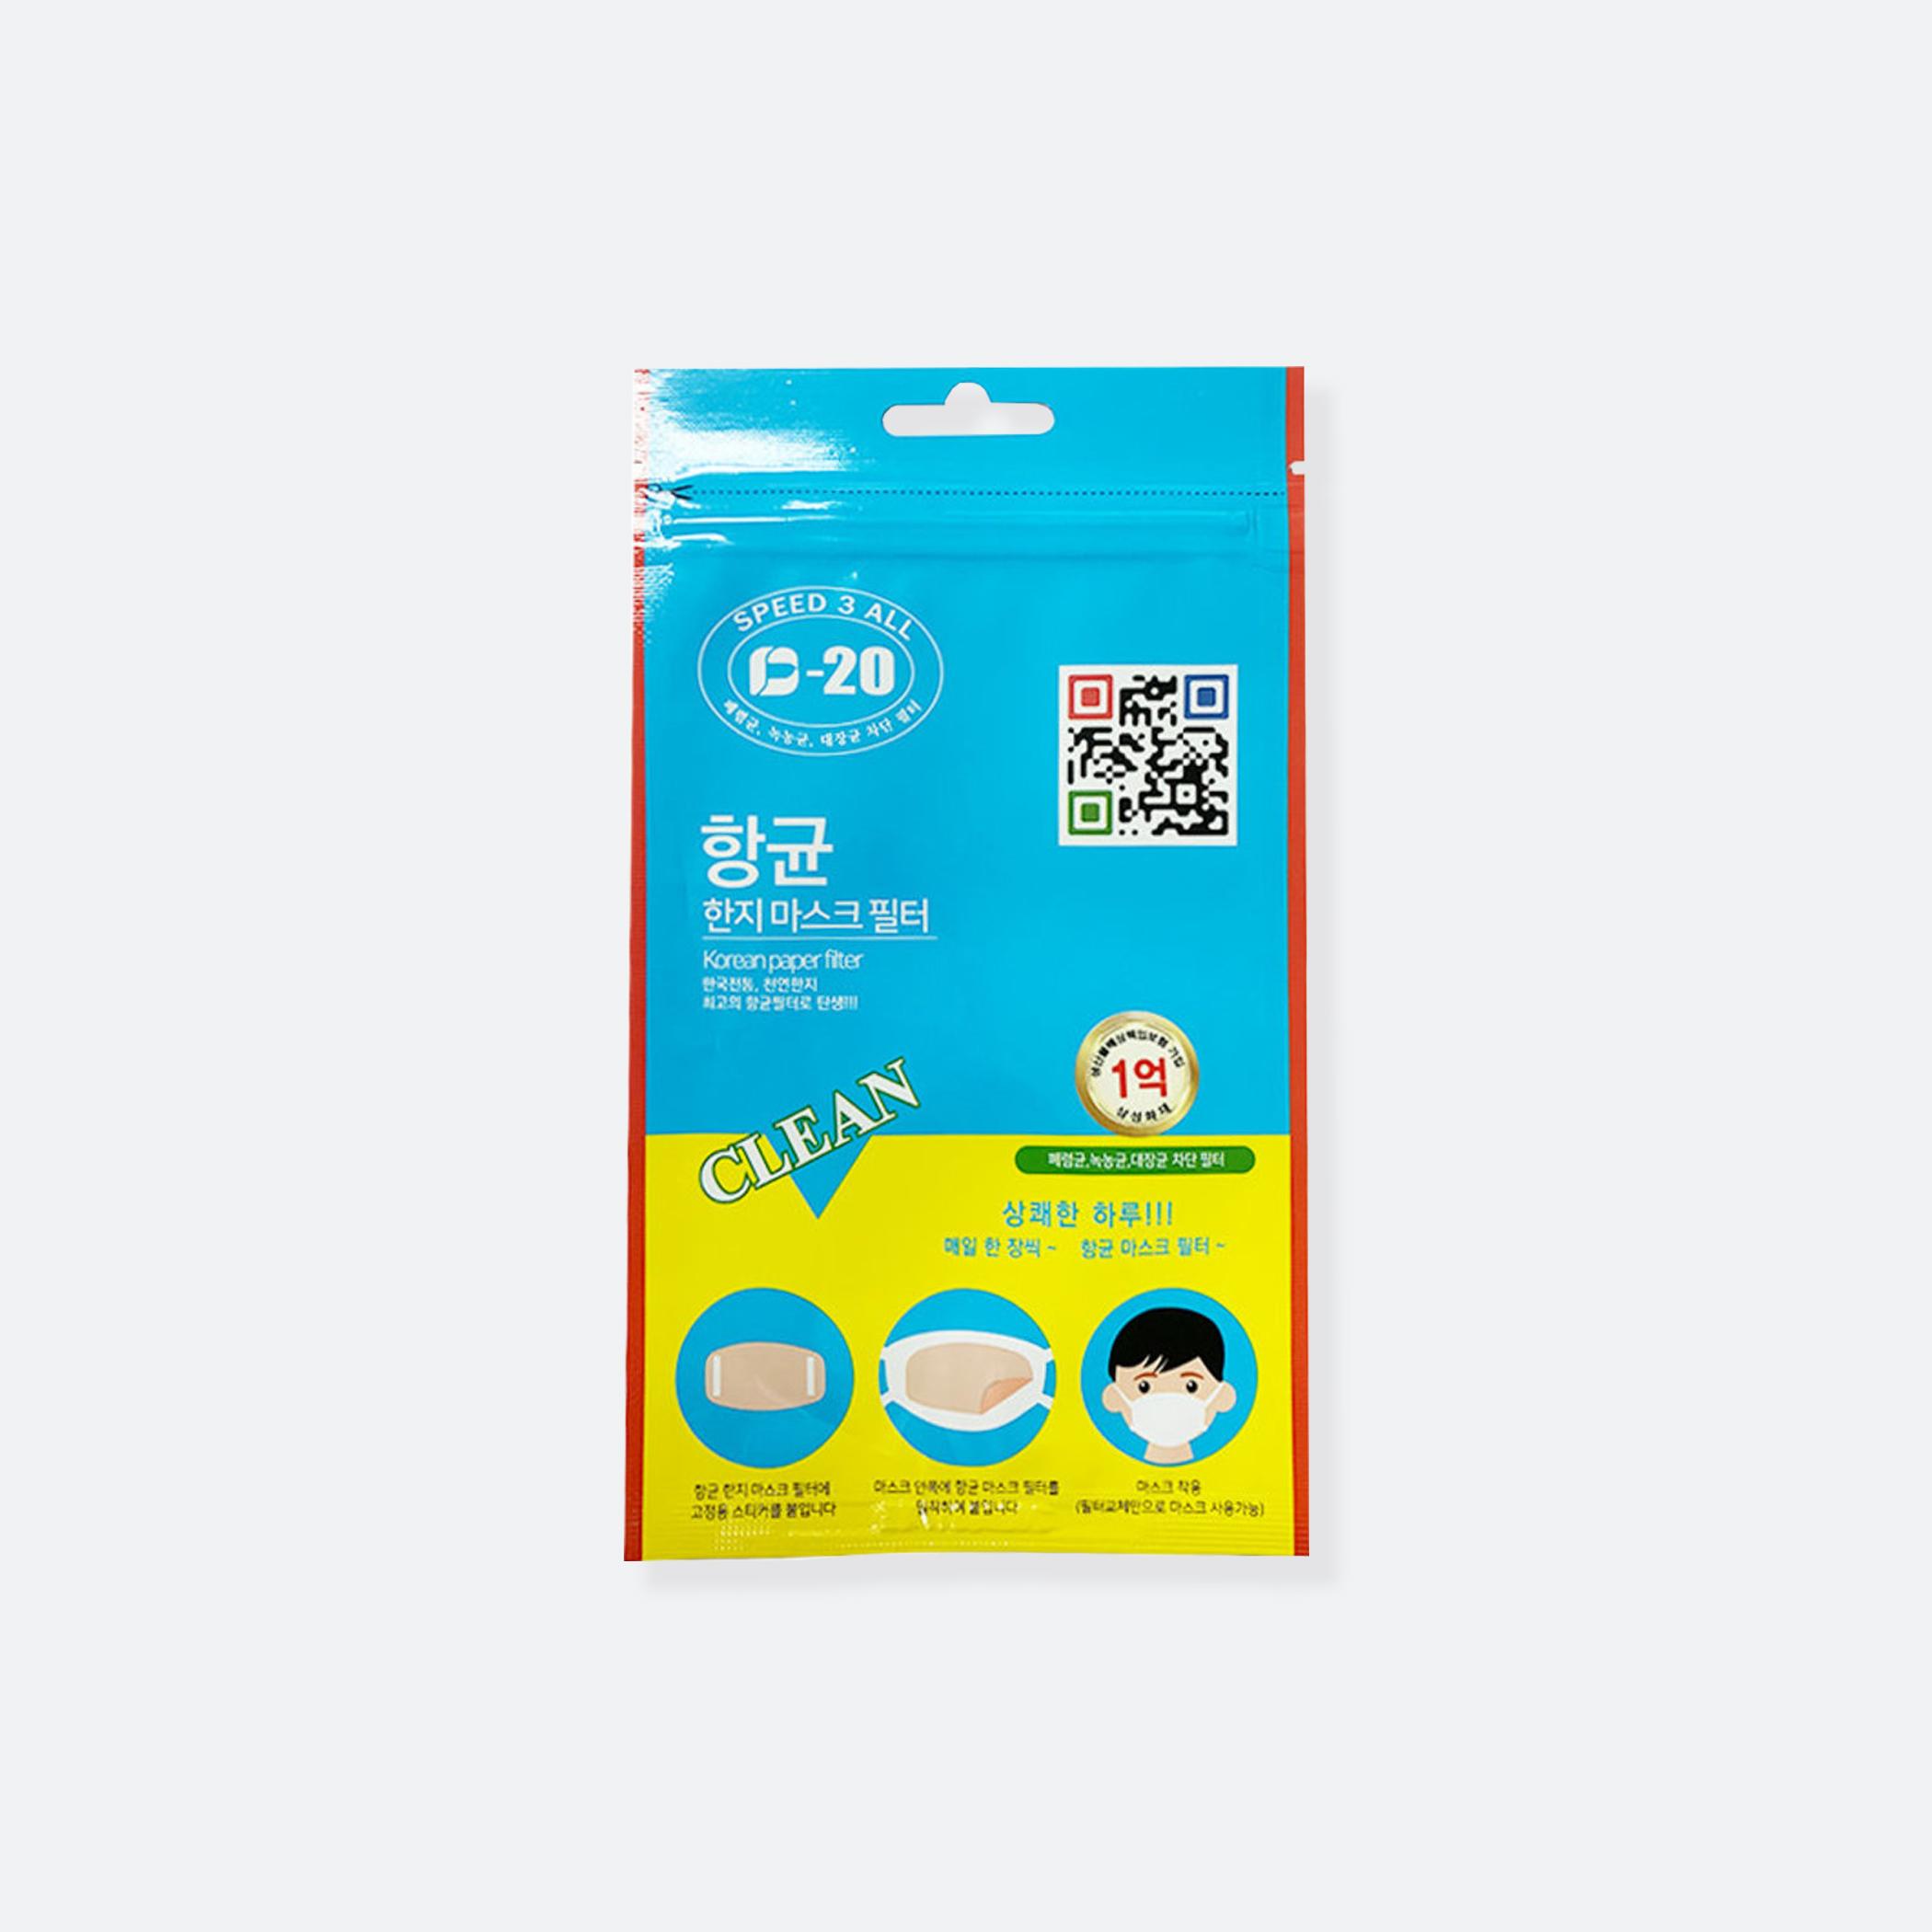 OhMart D20 Korean Paper Mask Filter (10piece) 2